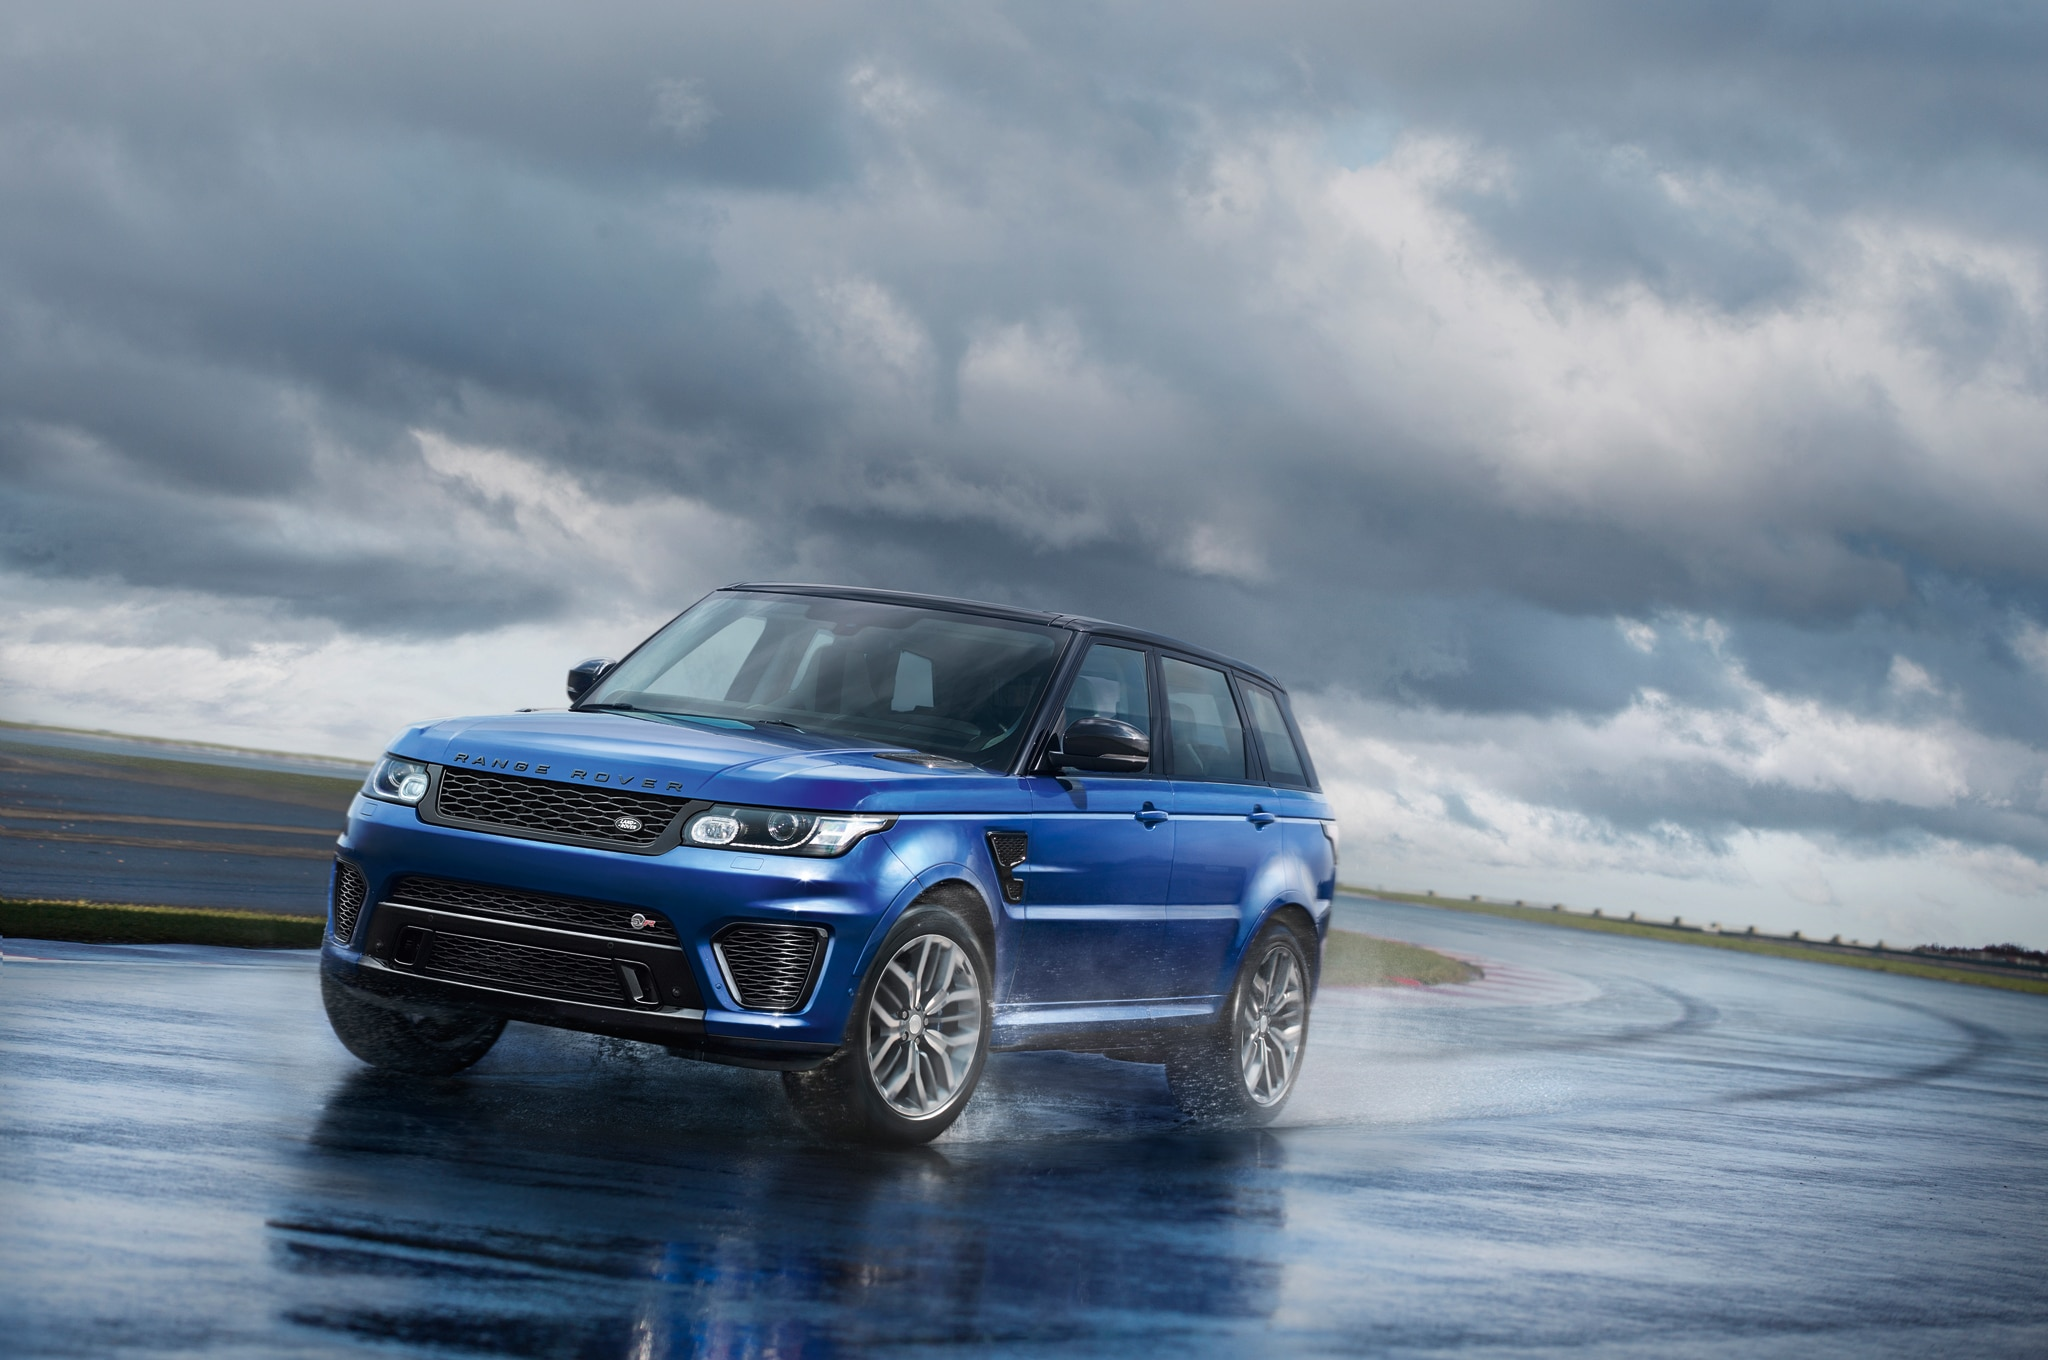 2015 Land Rover Range Rover Sport SVR Front Three Quarters